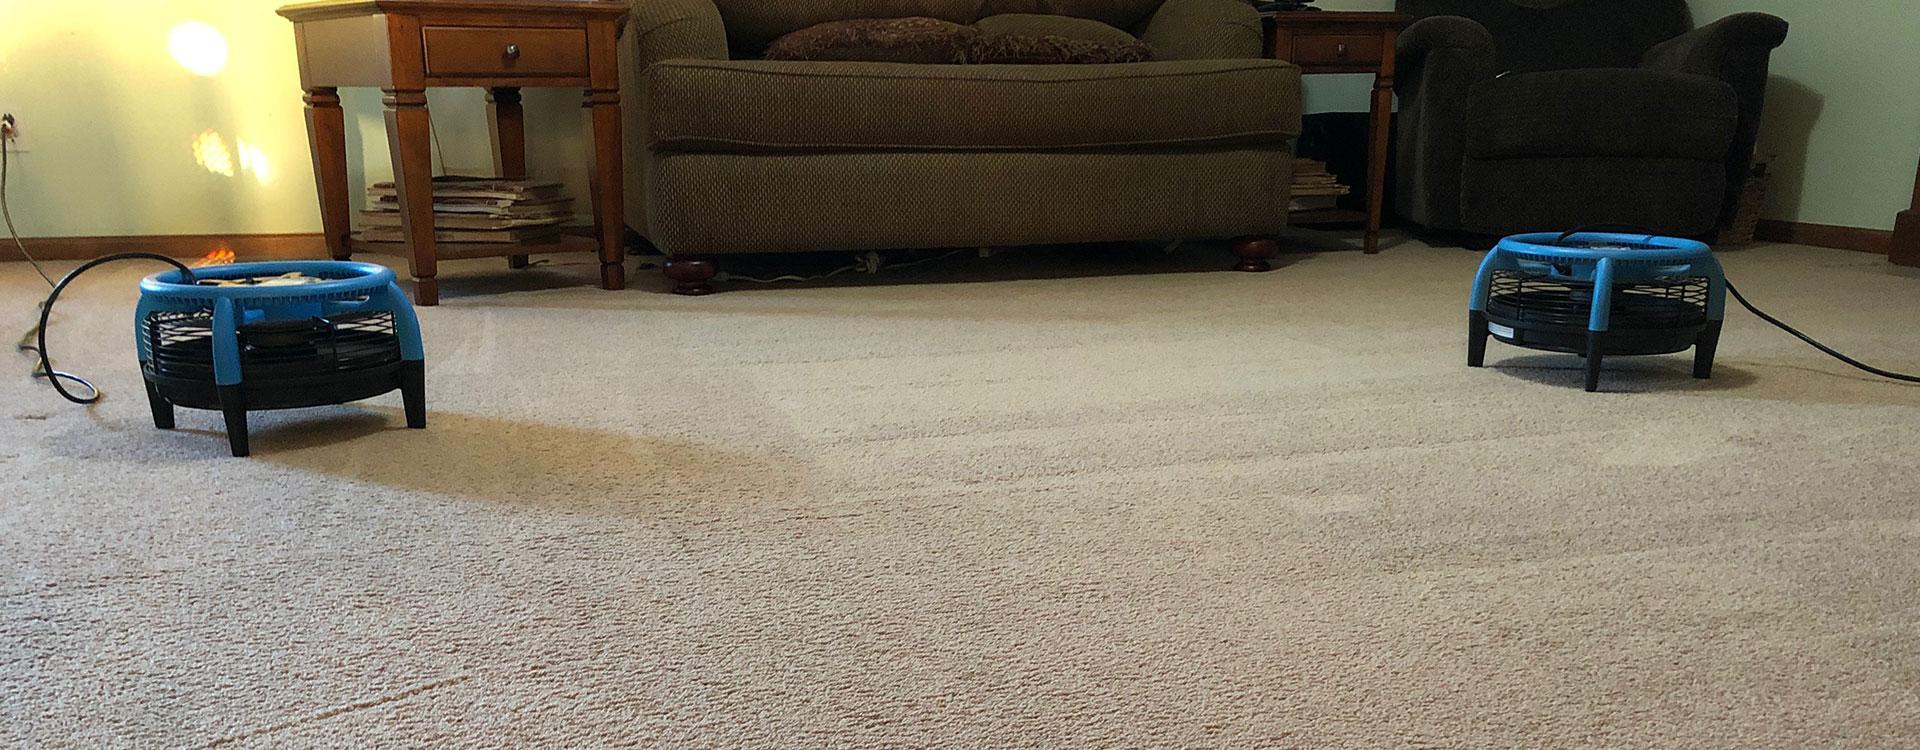 Speedy carpet drying process